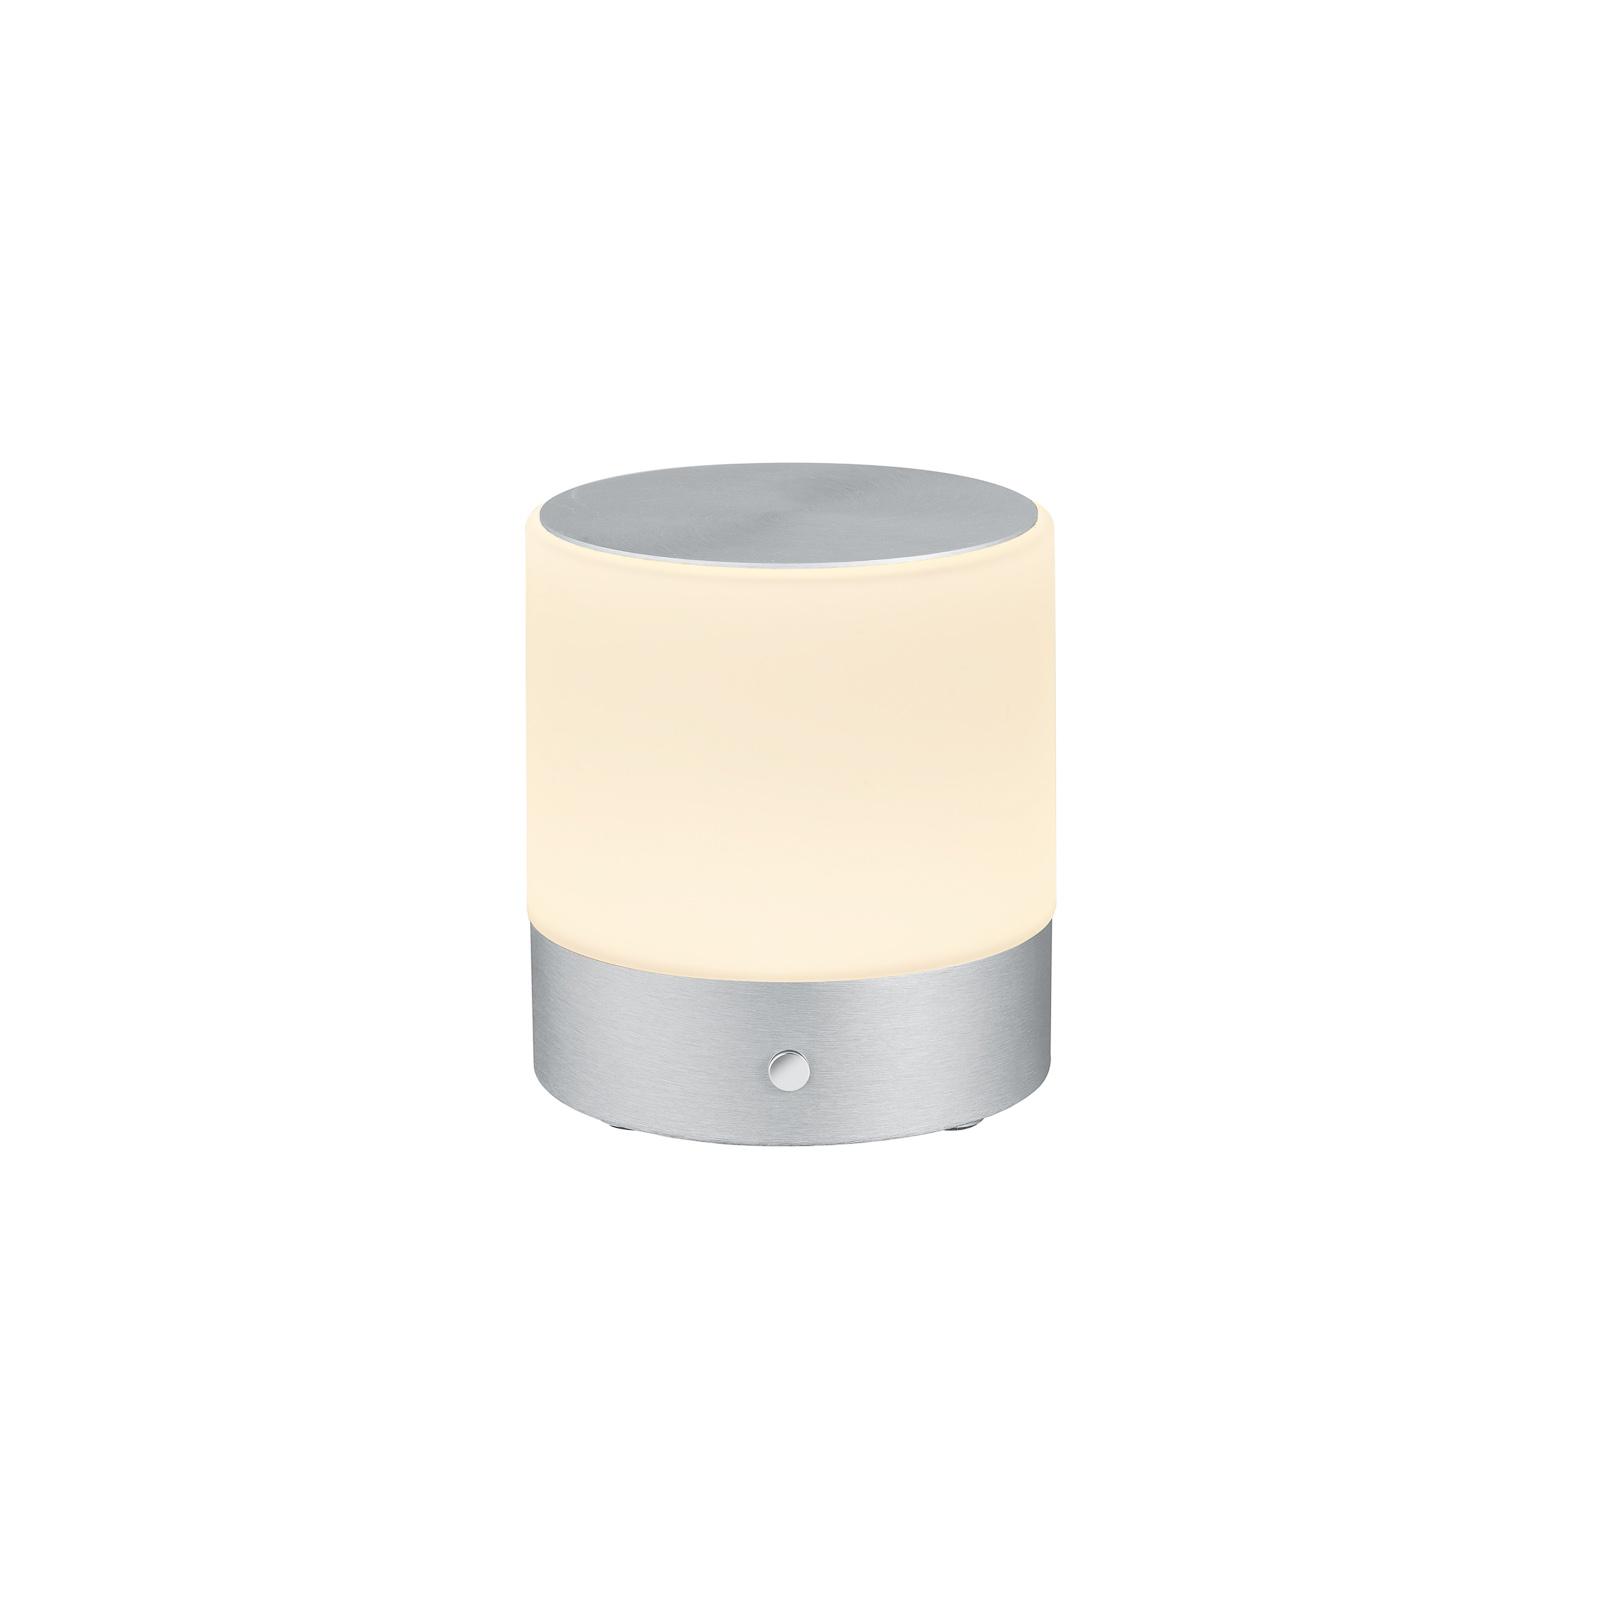 BANKAMP Button LED-Tischlampe Höhe 18,5cm alu